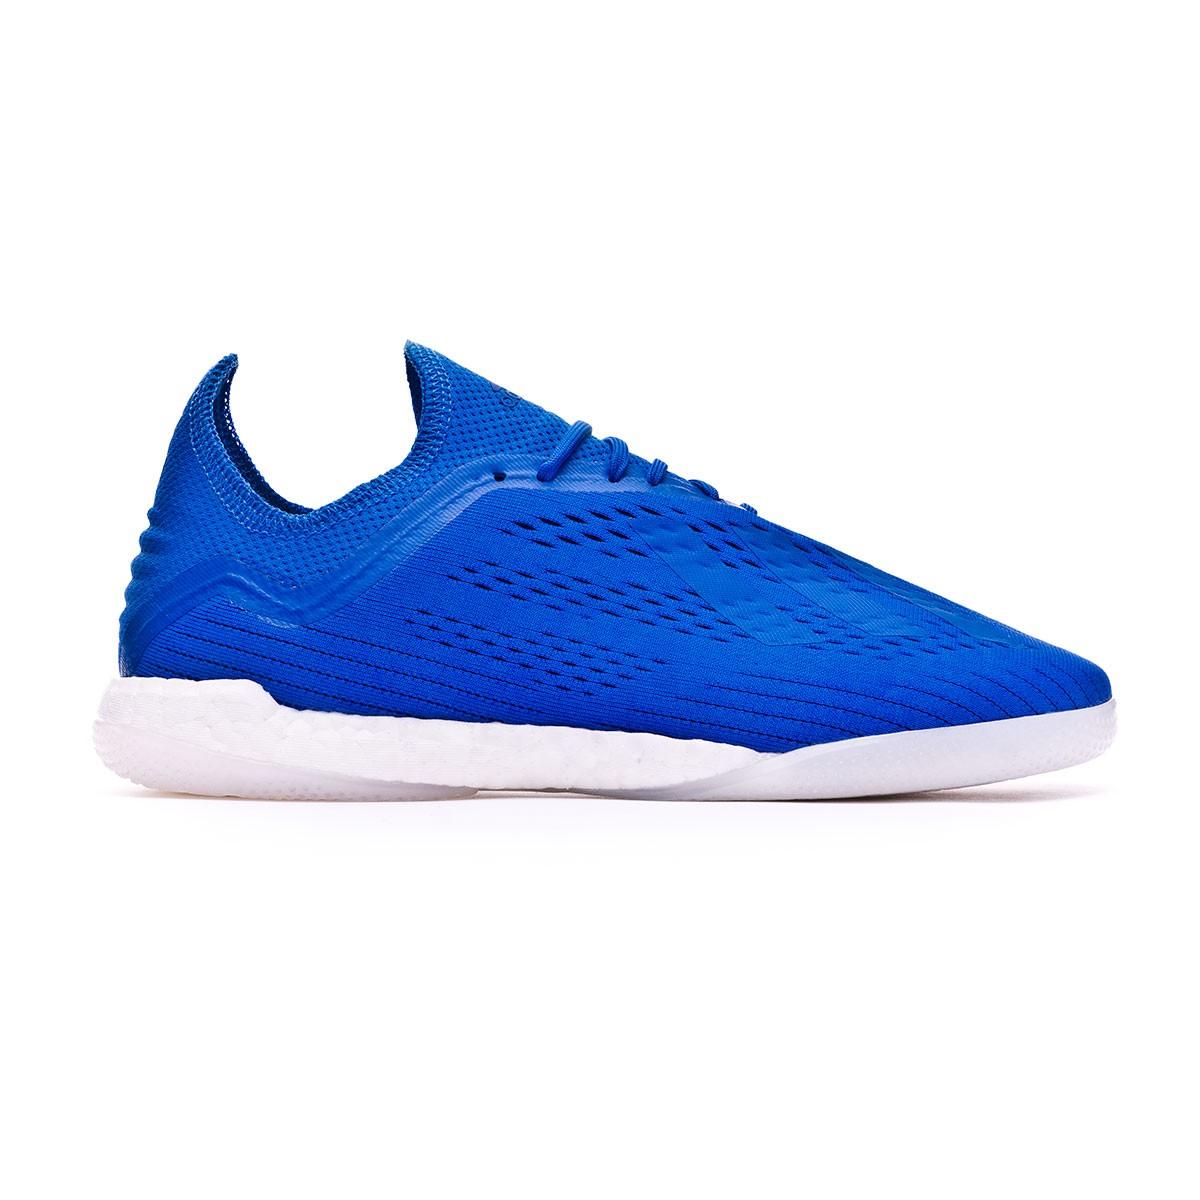 3c5a8007bcd2 Trainers adidas X Tango 18.1 TR Foot blue-Solar yellow - Football store  Fútbol Emotion